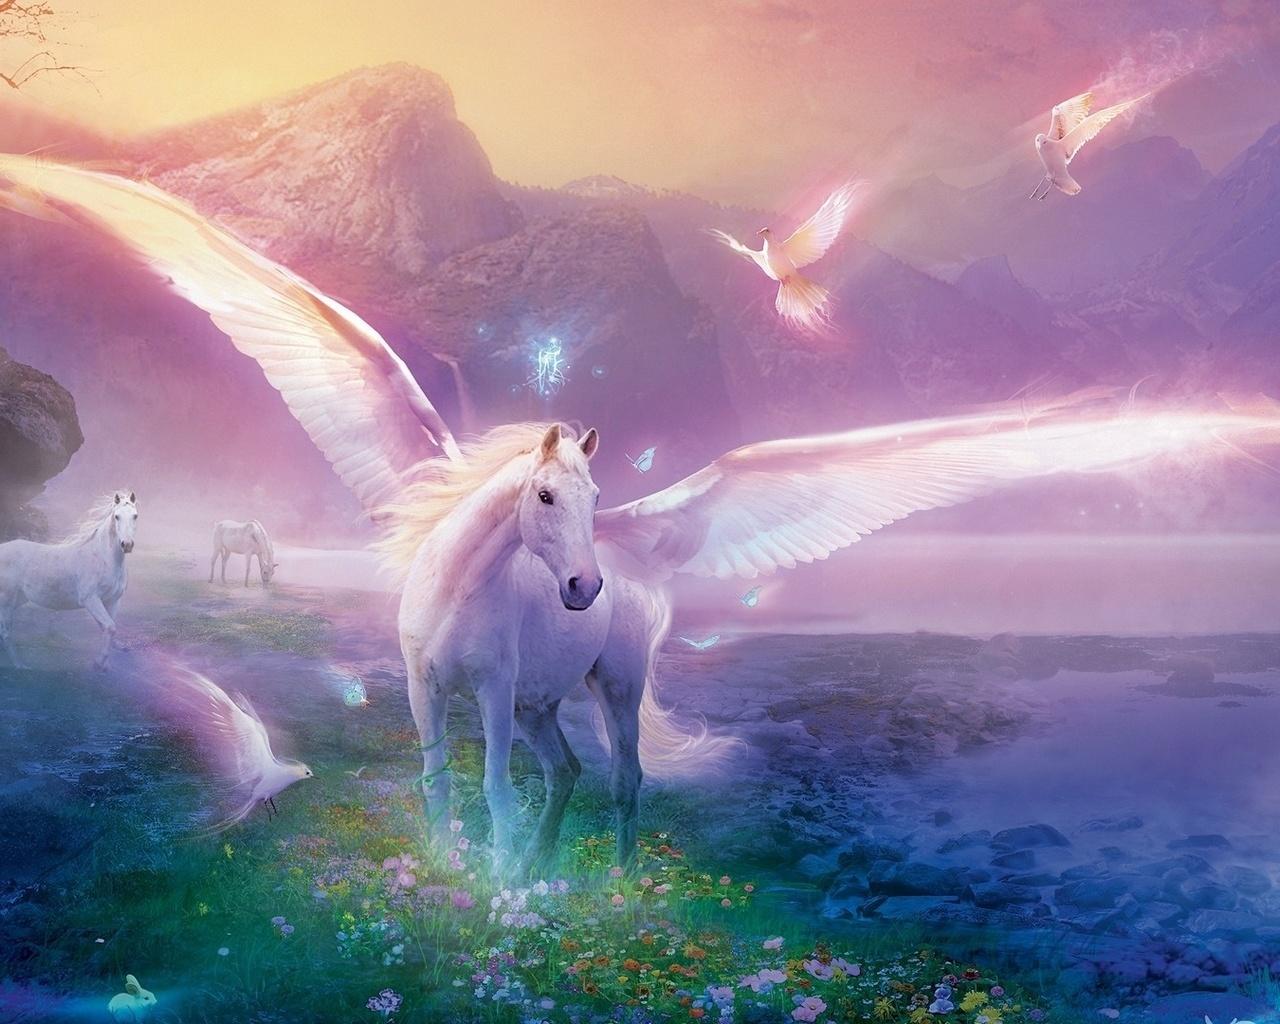 ... , кони, цветы - обои 1280x1024, картинка №8290